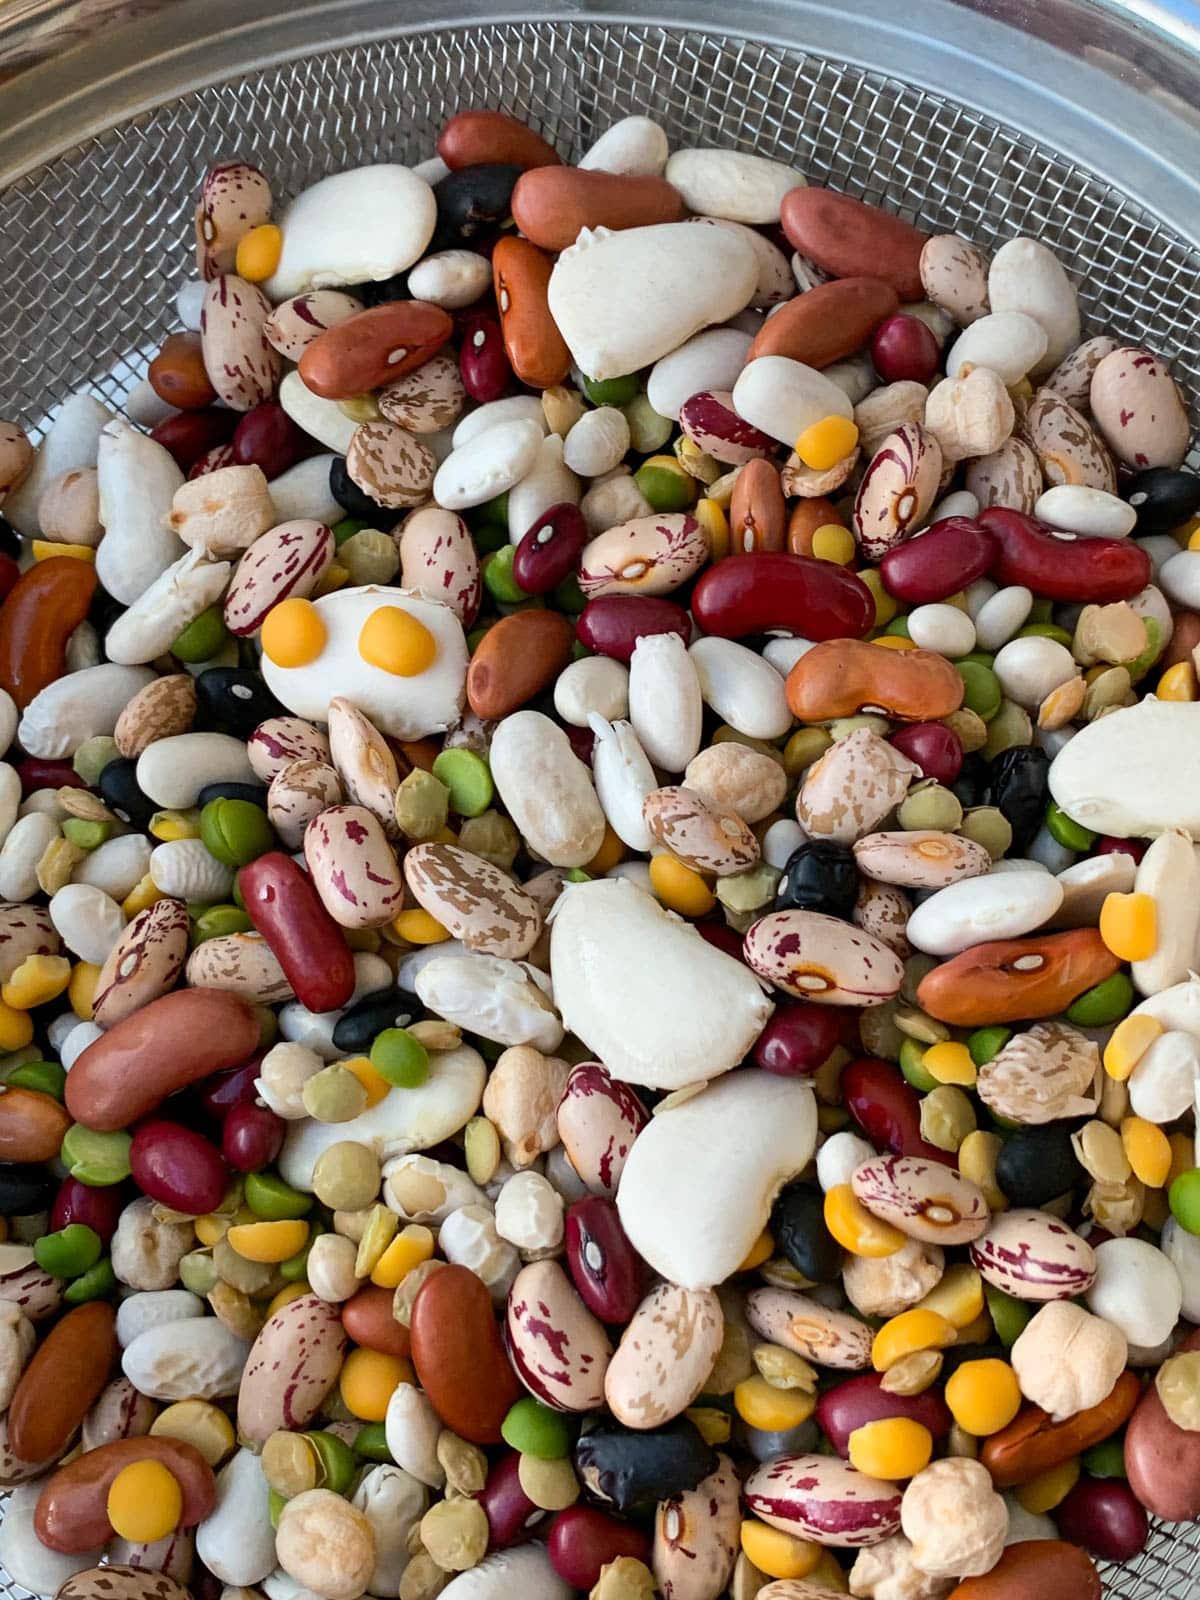 15 beans in colander